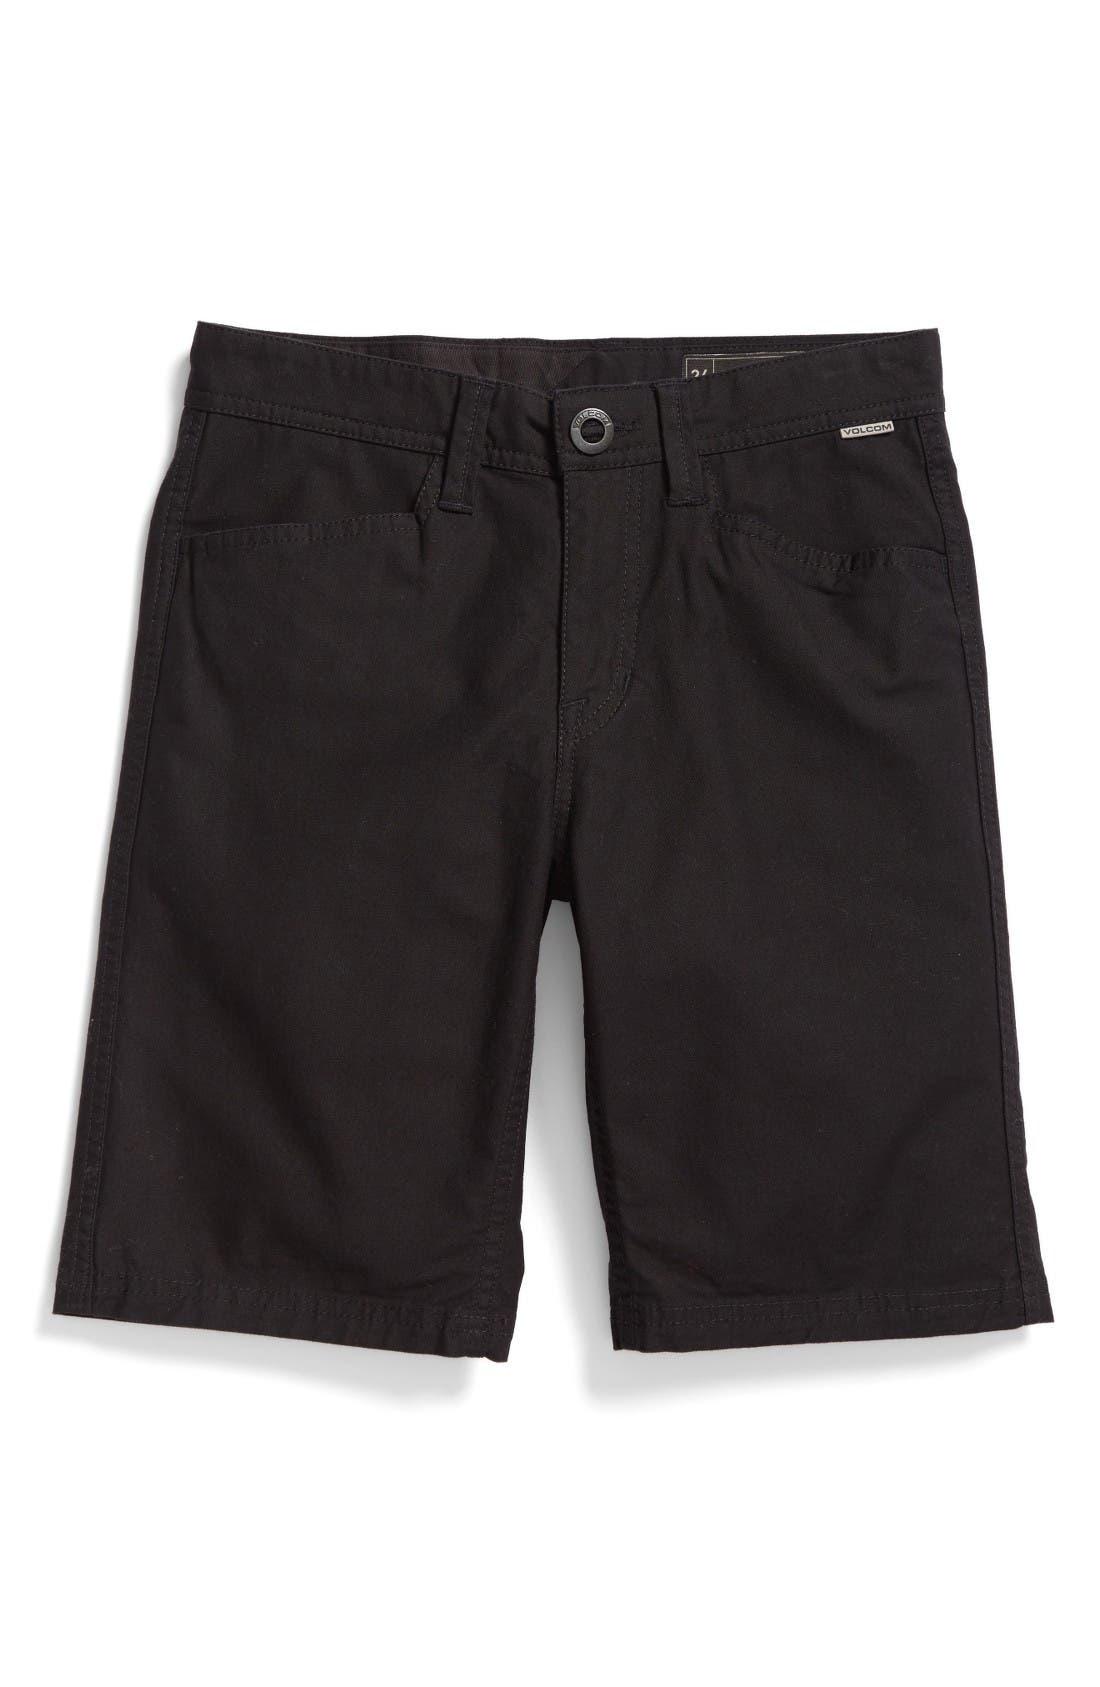 Volcom VSM Gritter Chino Shorts (Big Boys)